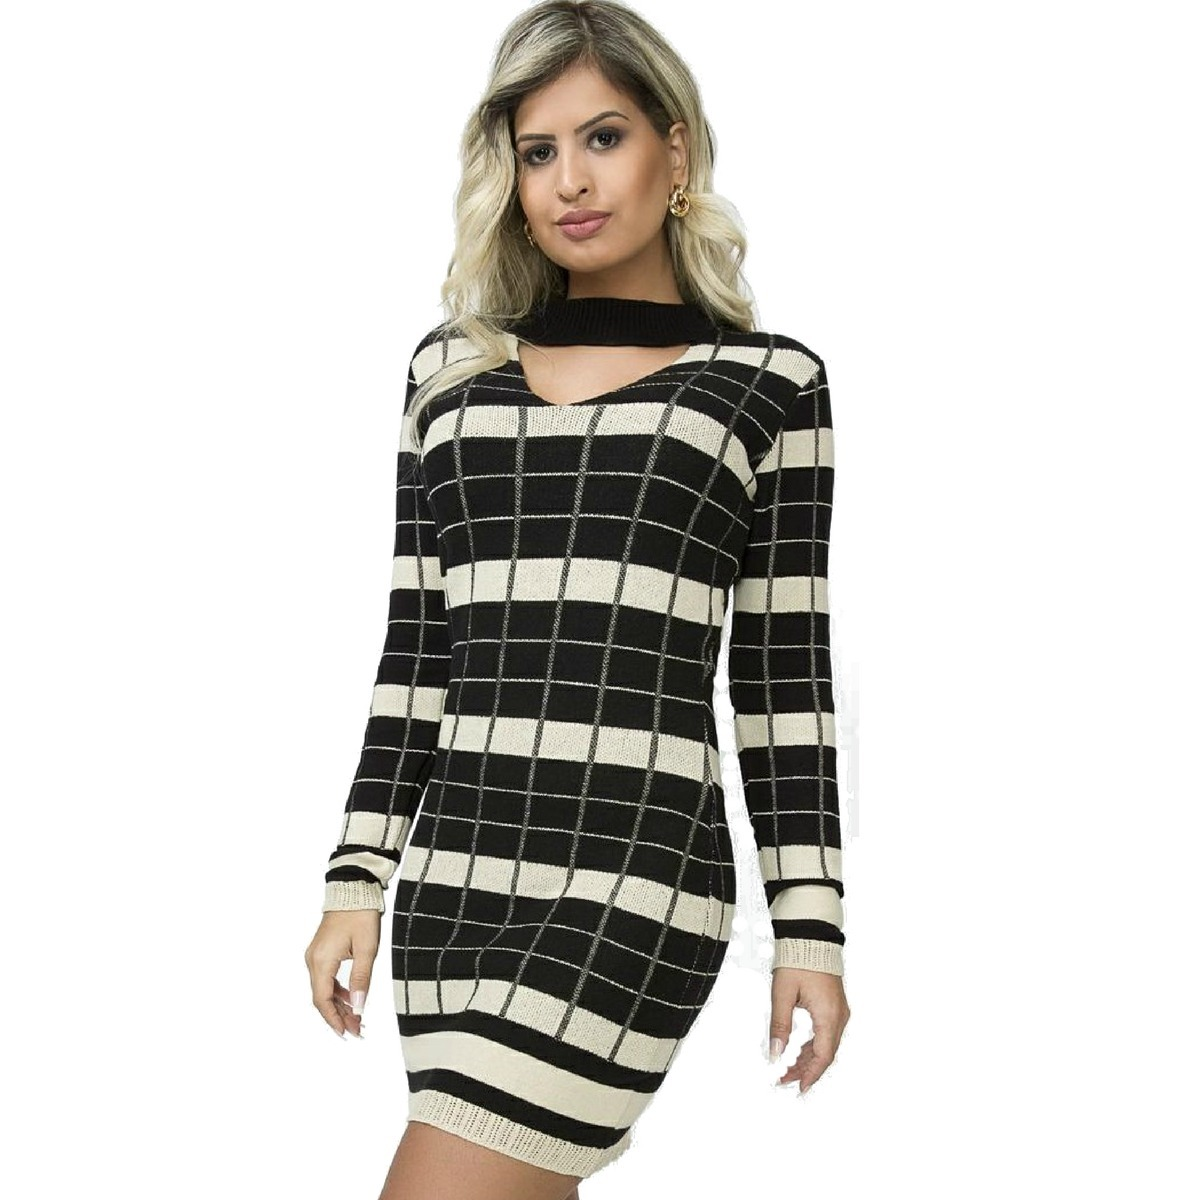 88cdd5ec7a vestido curto preto e branco trico manga longa inverno 2018. Carregando zoom .